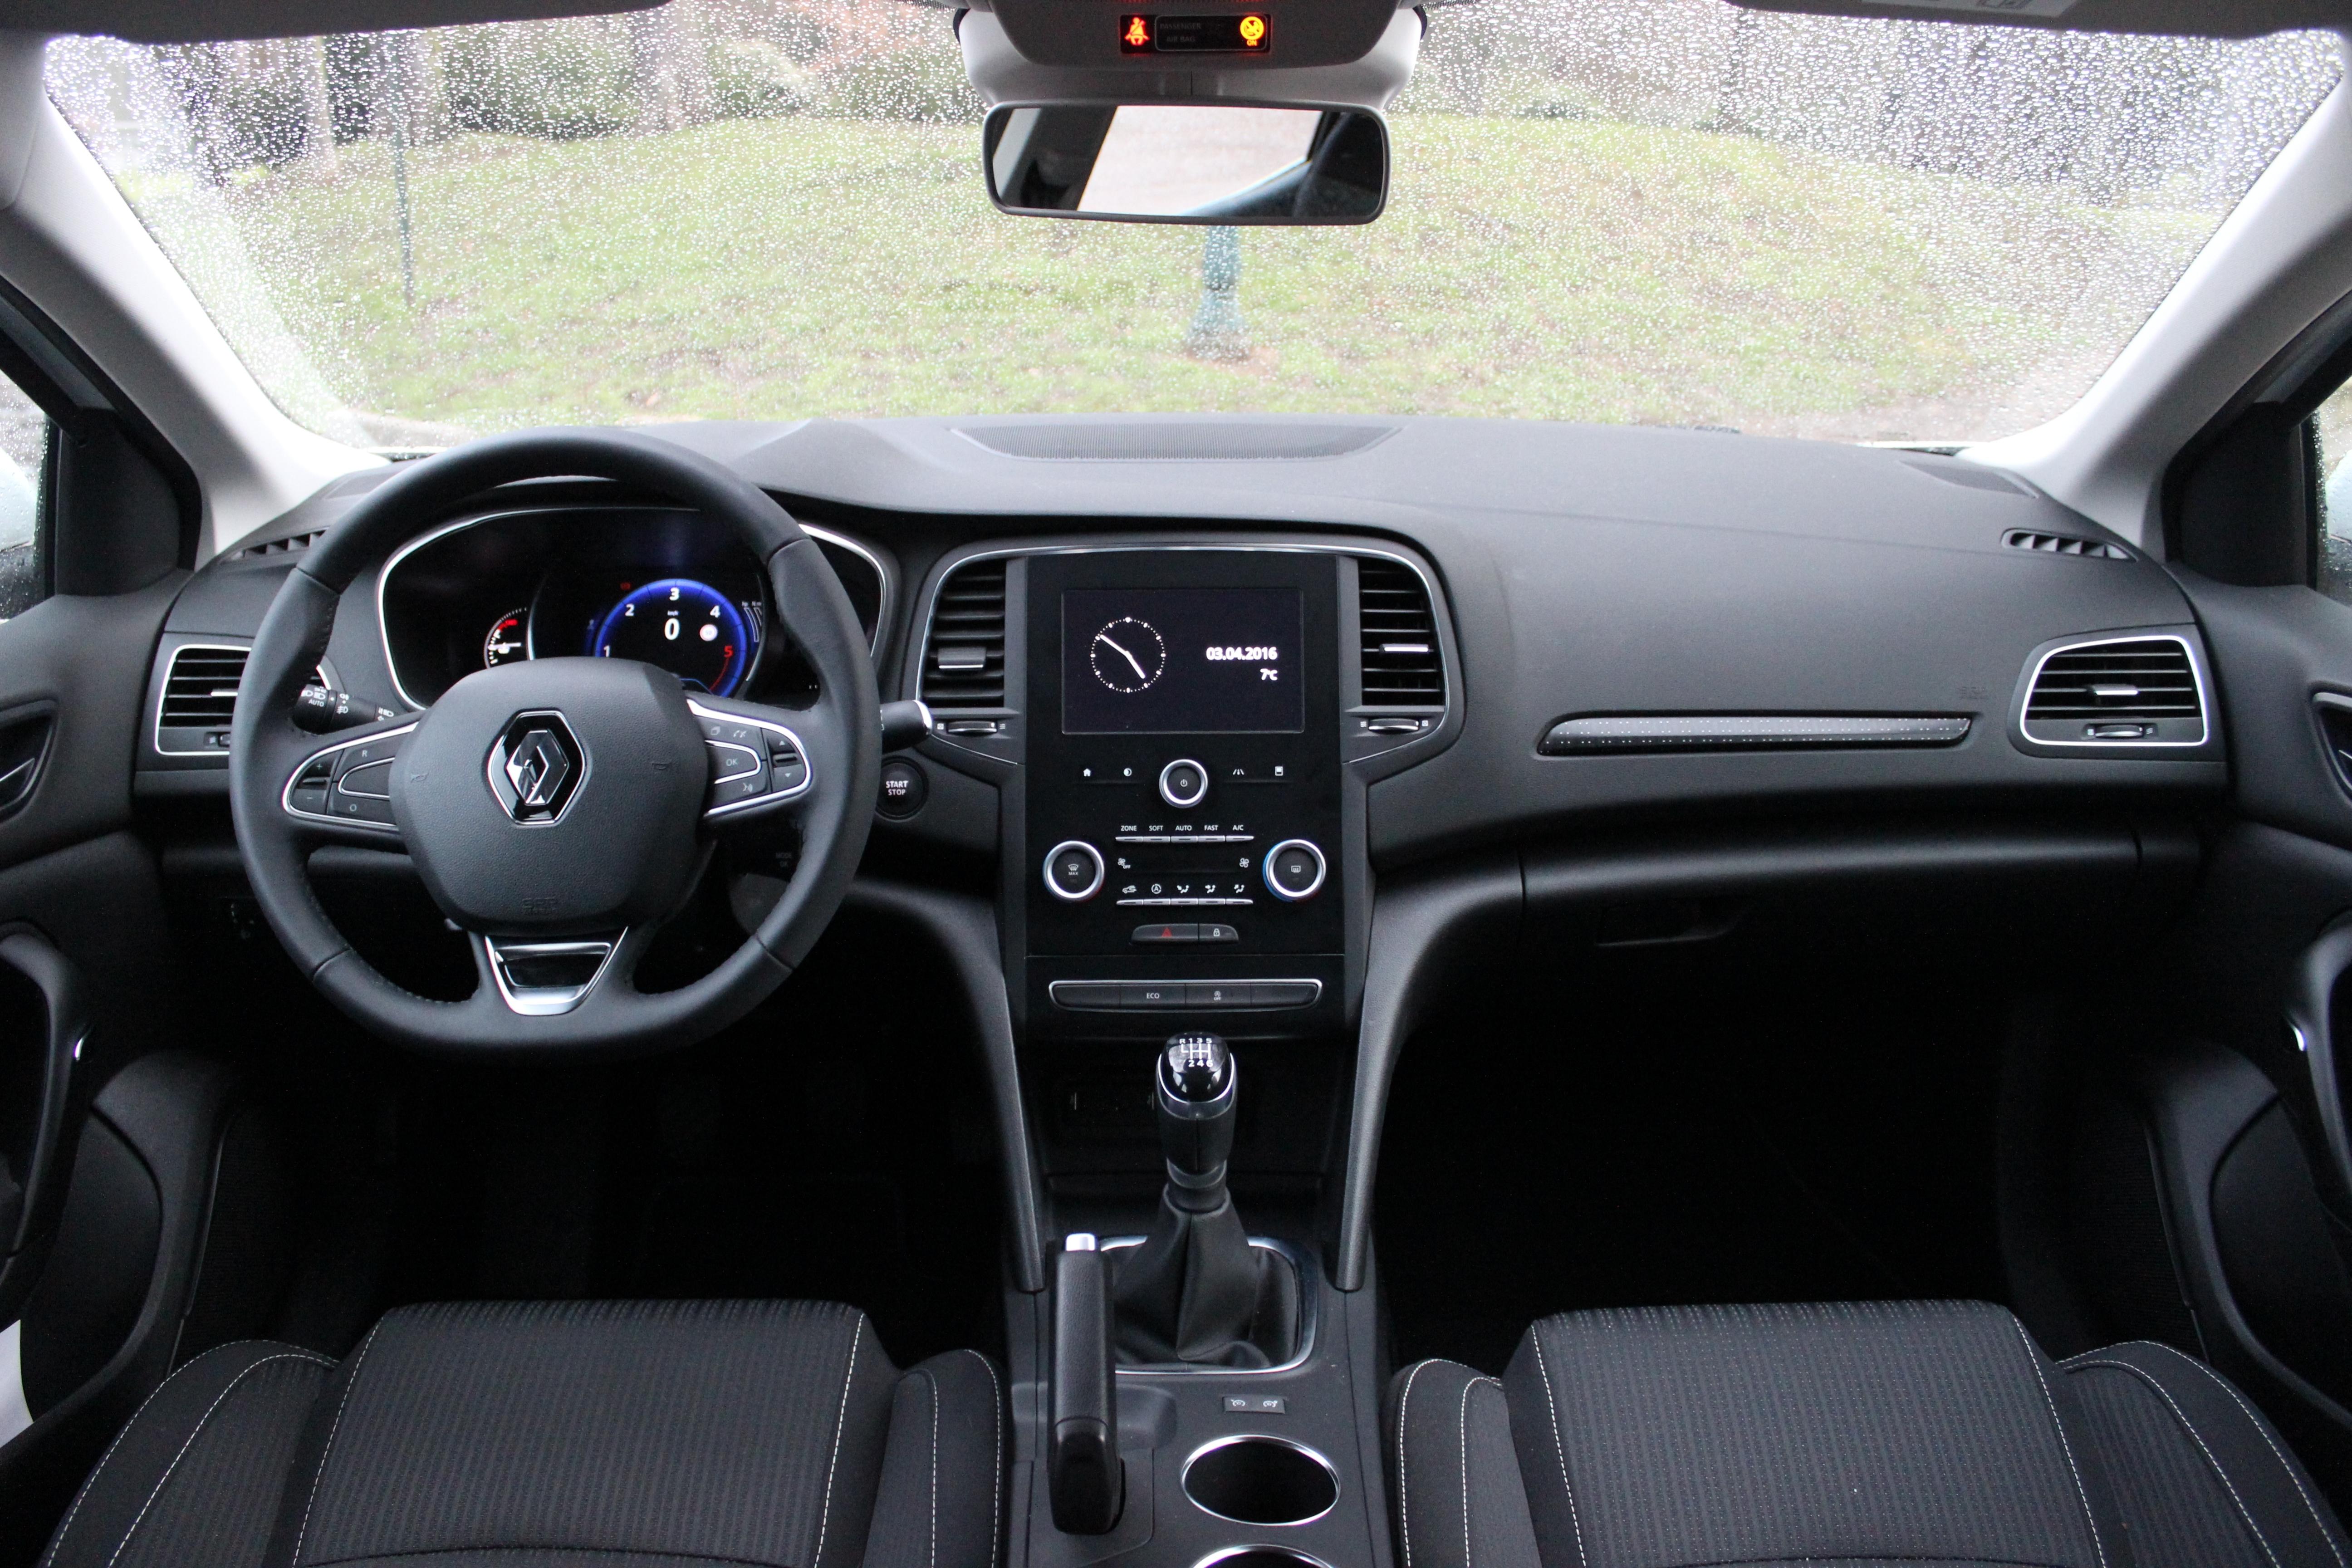 Comparativa: Opel Astra VS Renault Megane VS Volkswagen Golf  S0-comparatif-video-renault-megane-vs-opel-astra-vs-volkswagen-golf-la-deuxieme-tentative-sera-t-elle-la-bonne-378234